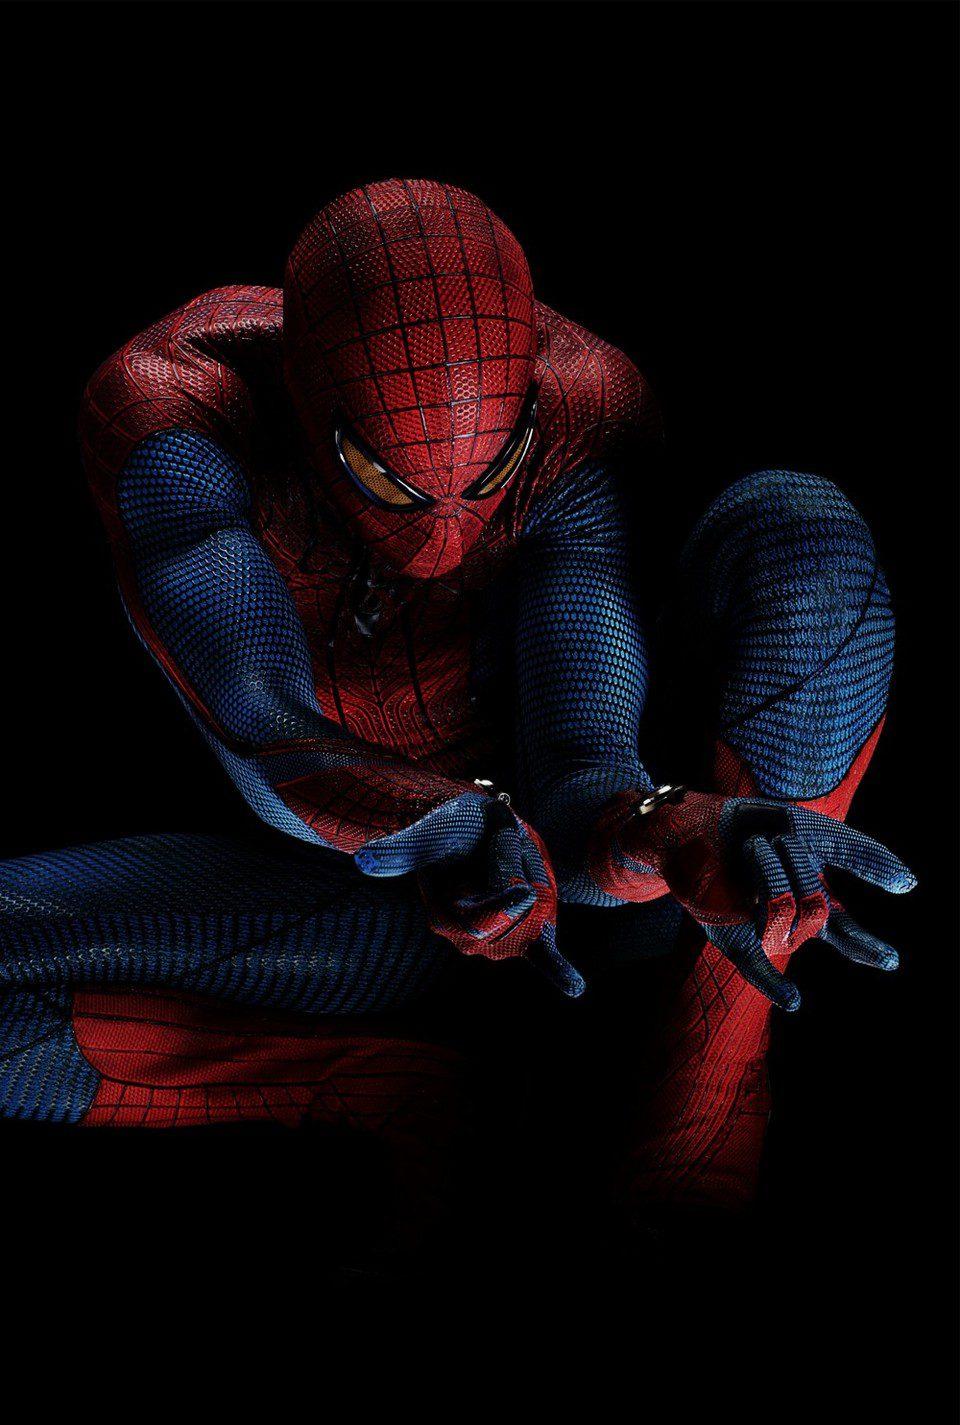 The Amazing Spider-Man, fotograma 11 de 38